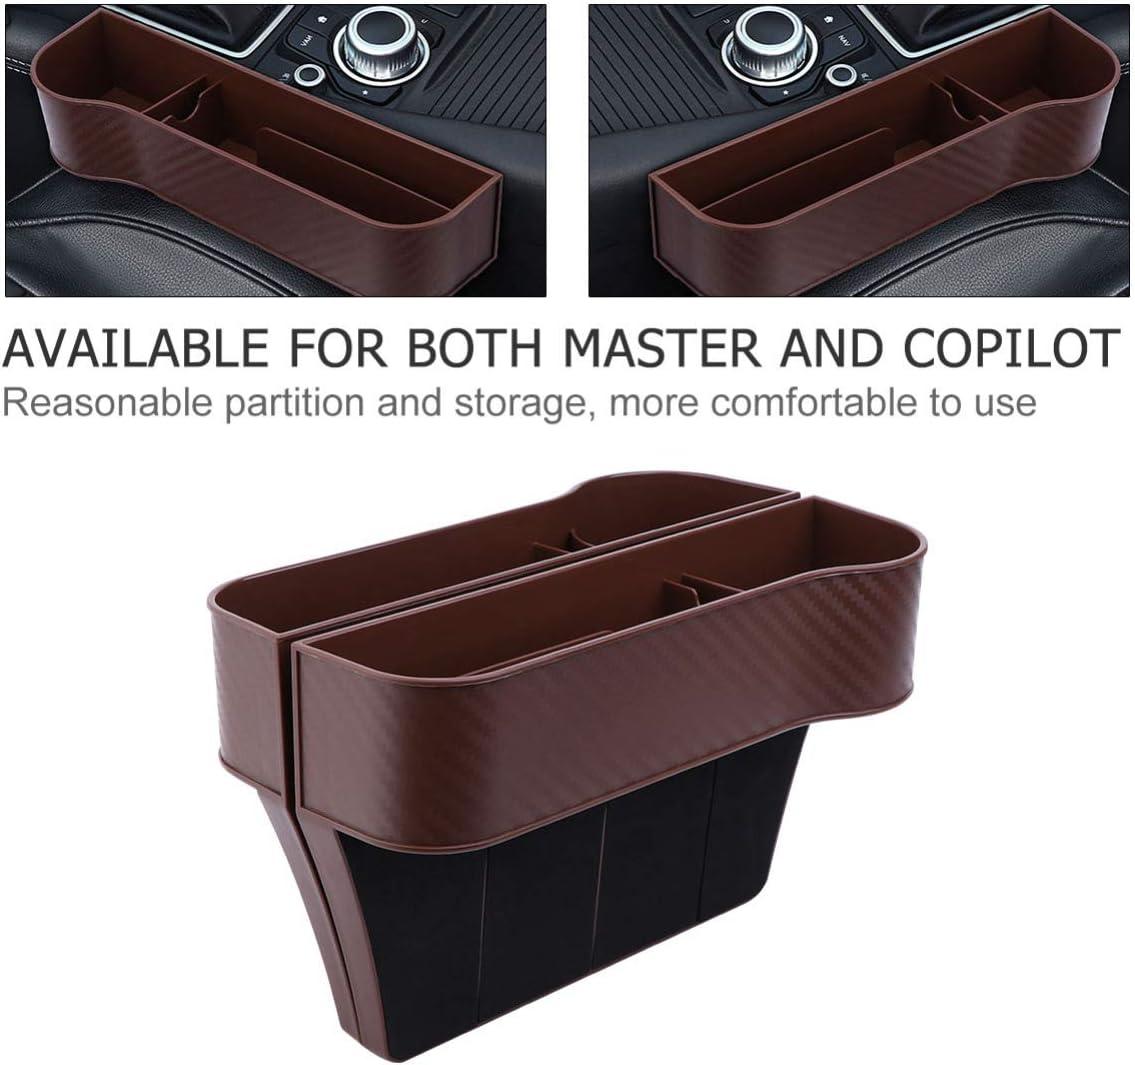 GARNECK 2pcs Car Seat Gap Organizer Storage Box Console Side Pocket Storage Couple Cup Holder Black